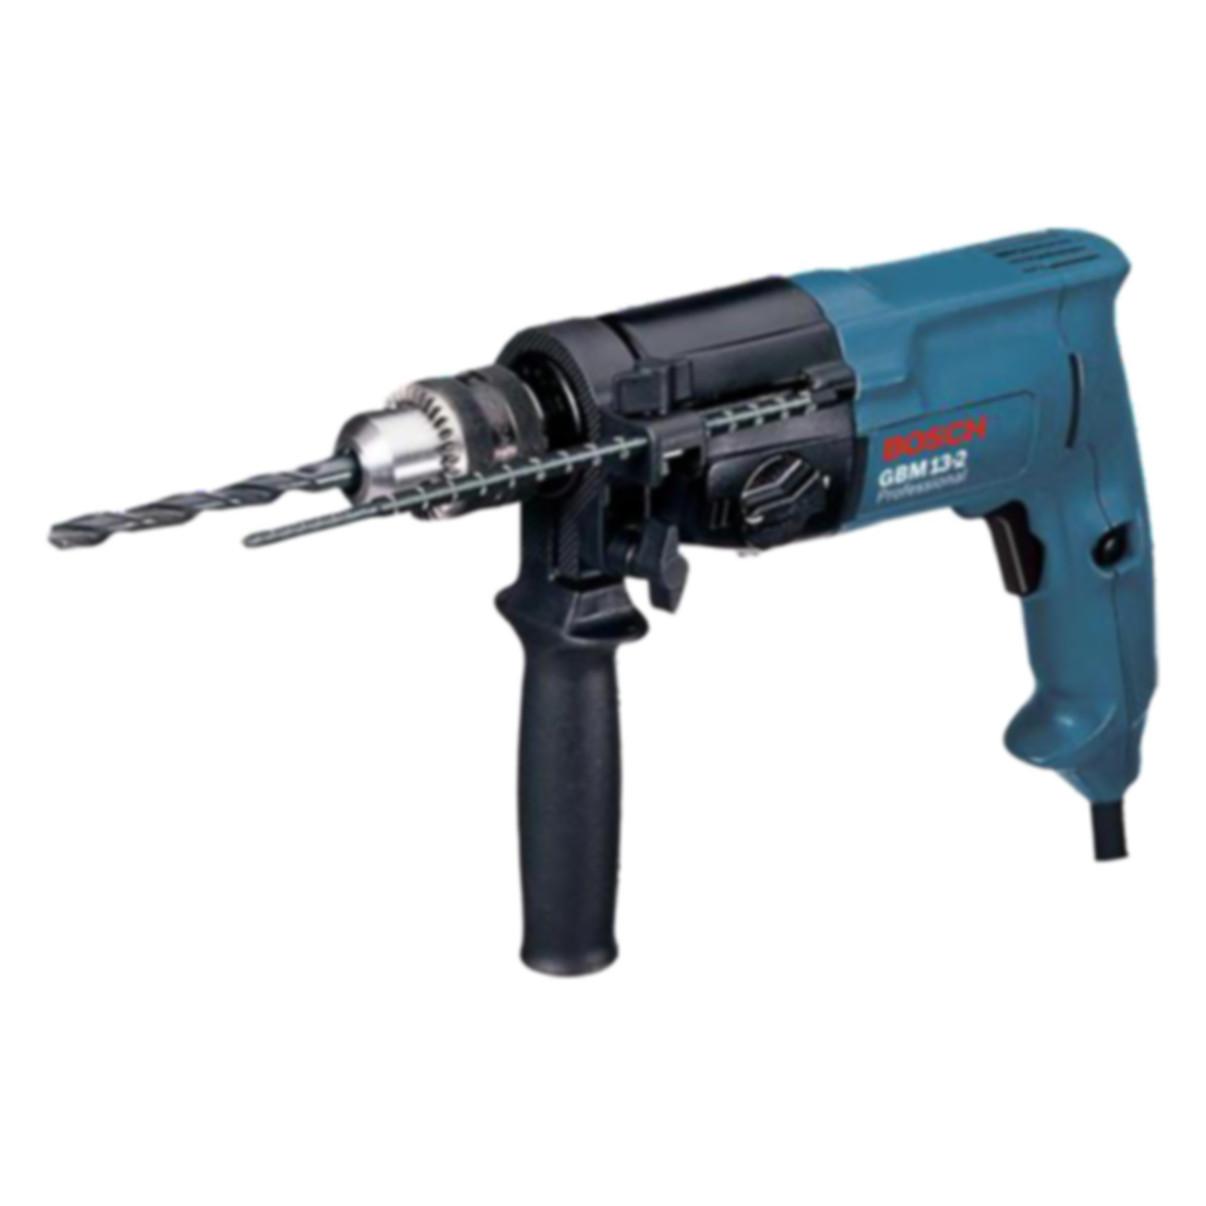 GBM 13-2 Professional